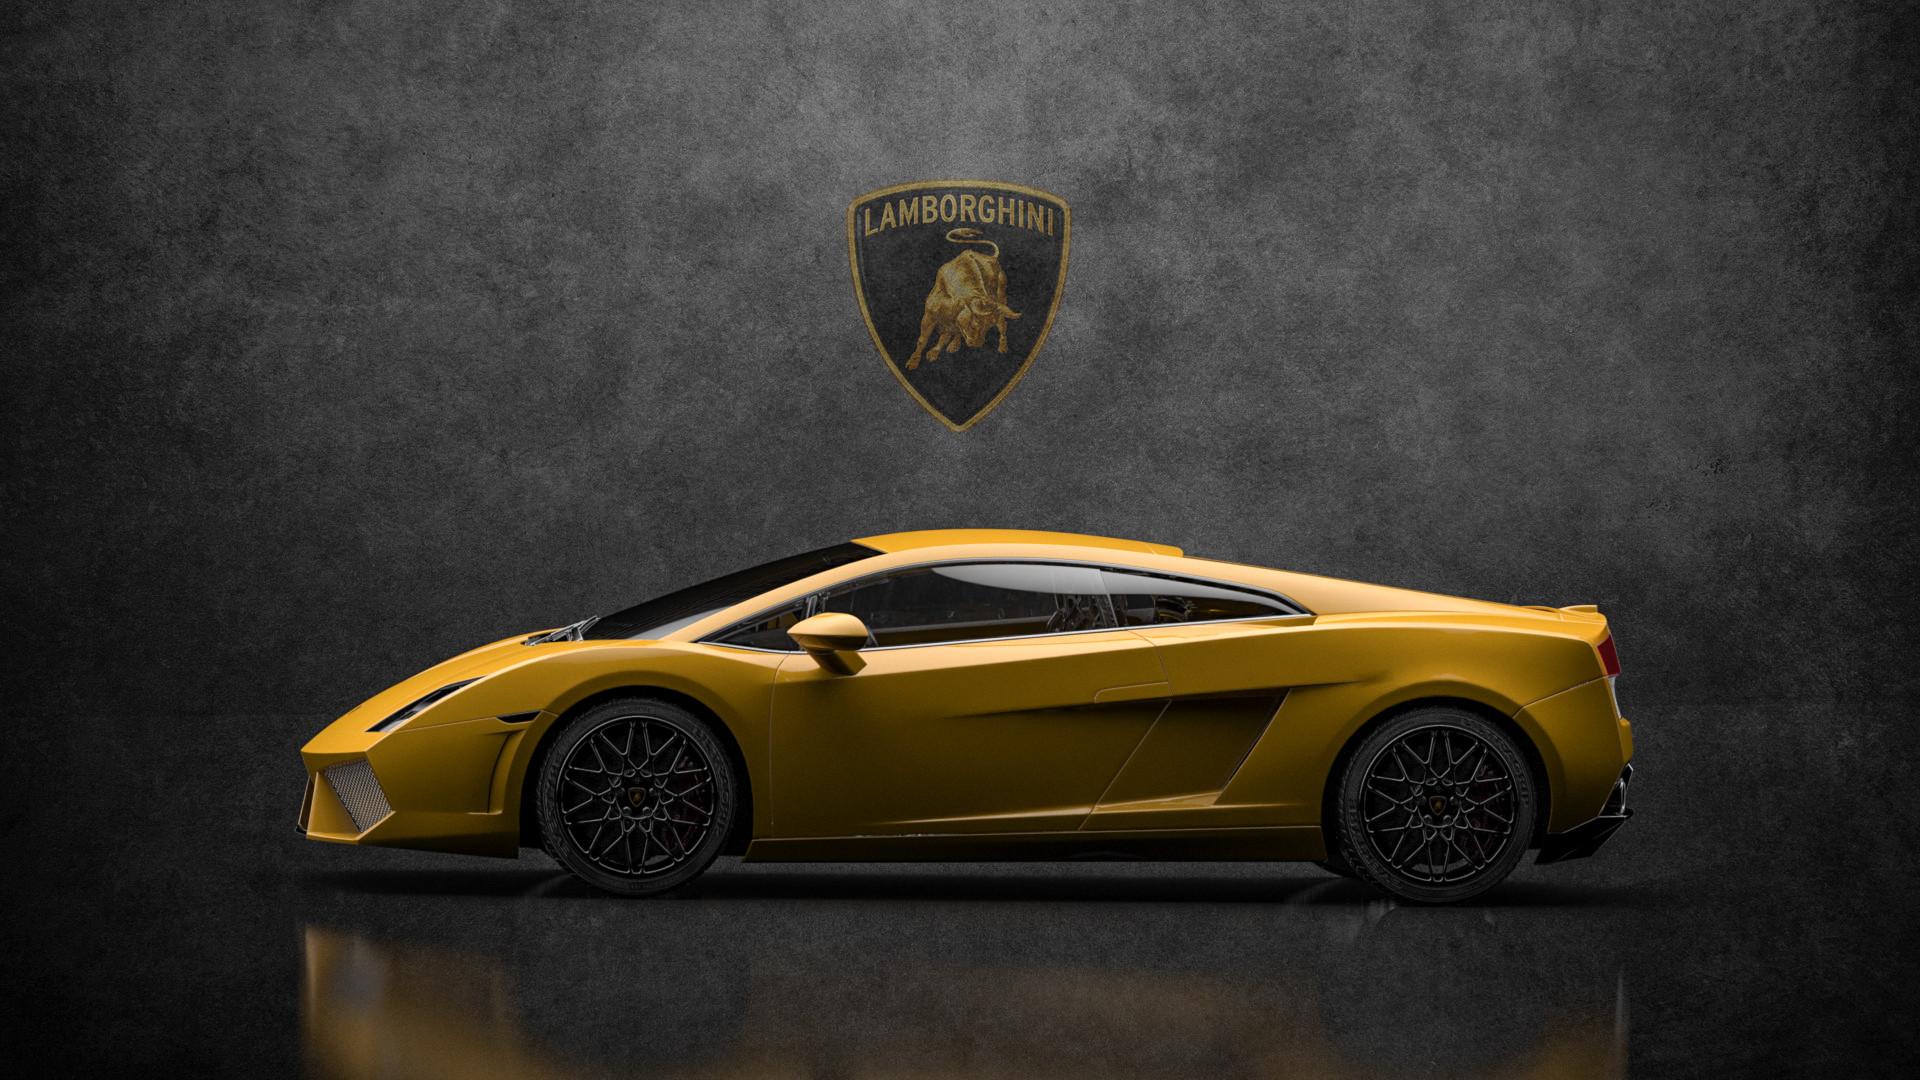 Mohamed Sabir Lamborghini Gallardo Lp 560 4 3d Wallpaper